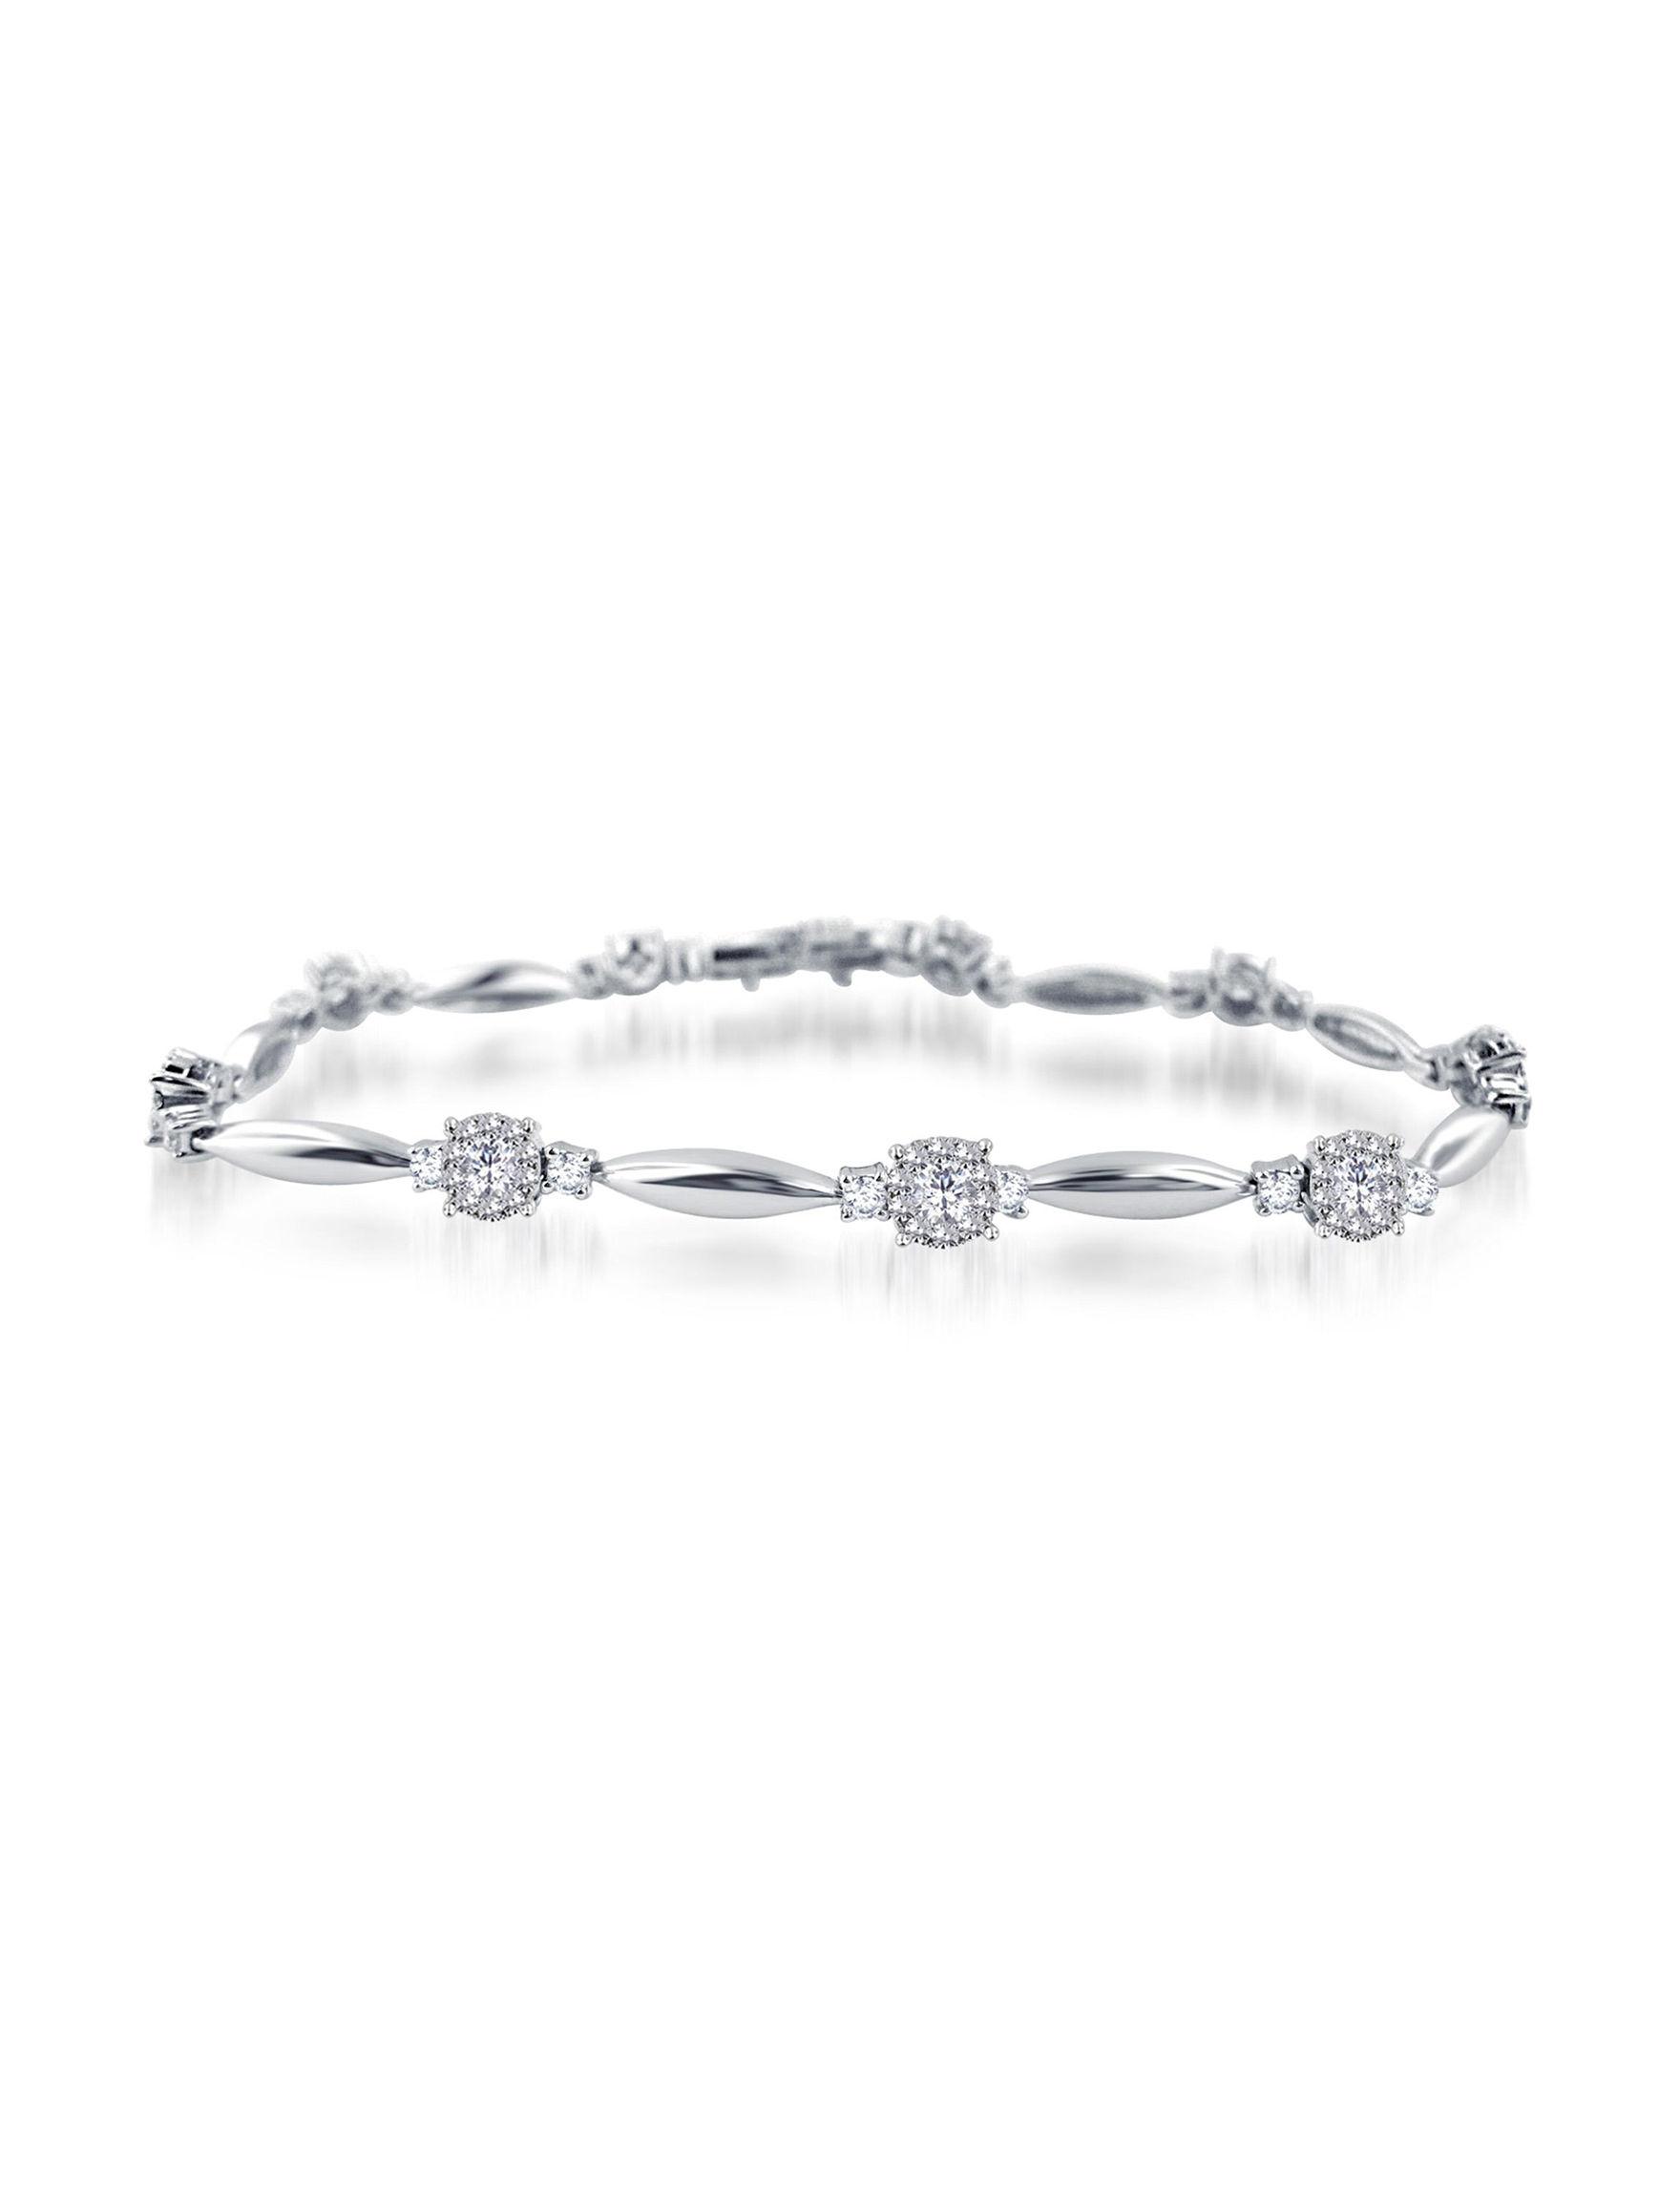 Kiran White Gold Bracelets Fine Jewelry